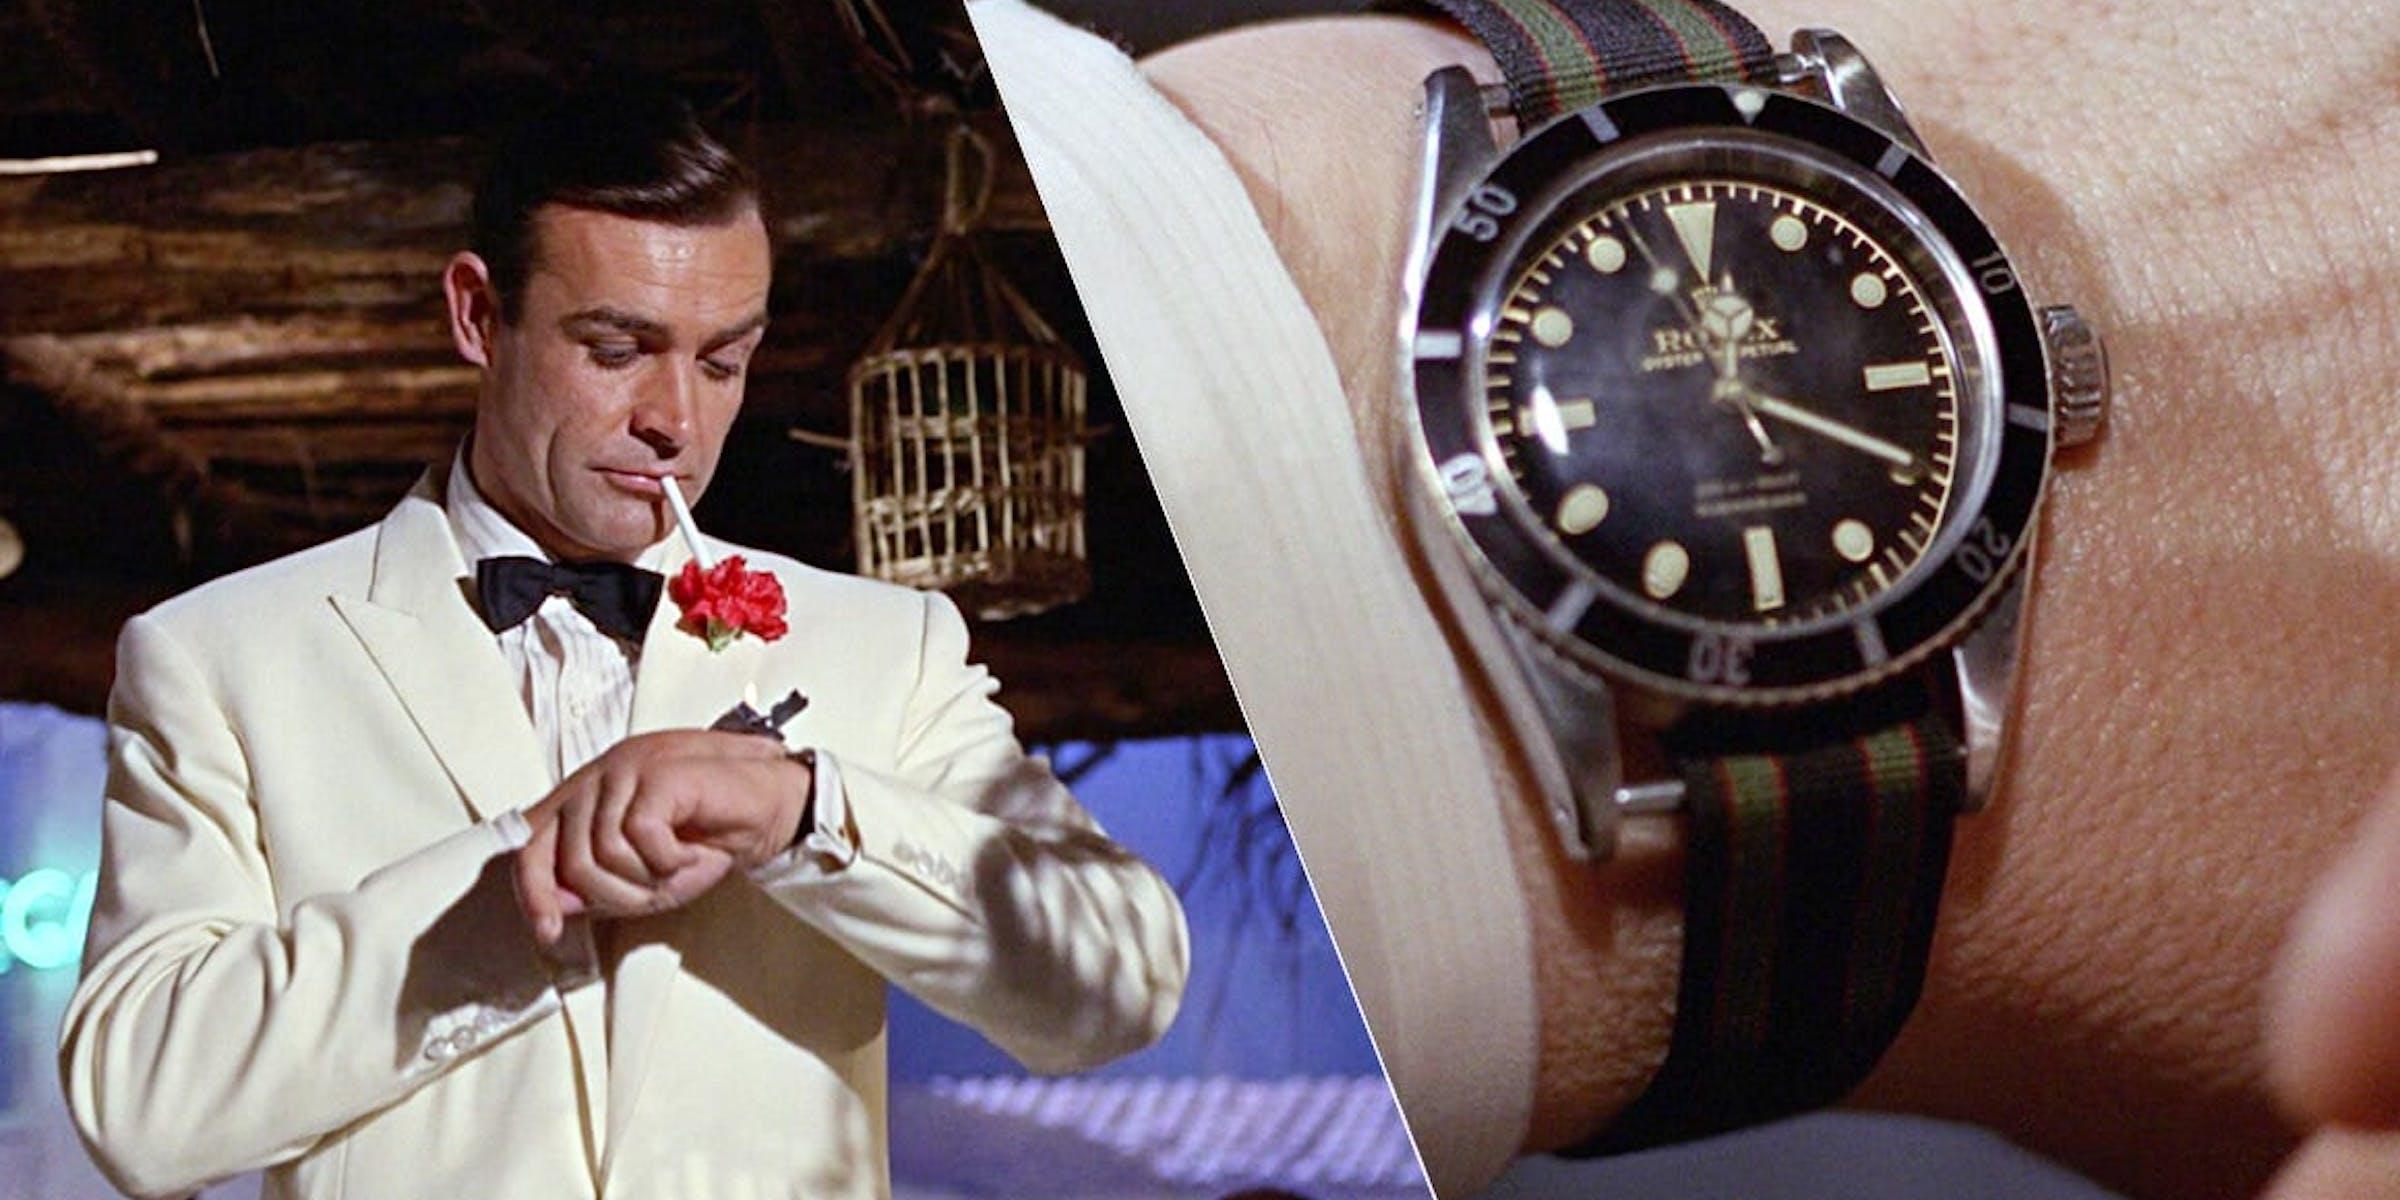 James Bond Watches, Images: Danjaq LLC, Sony Pictures Entertainment